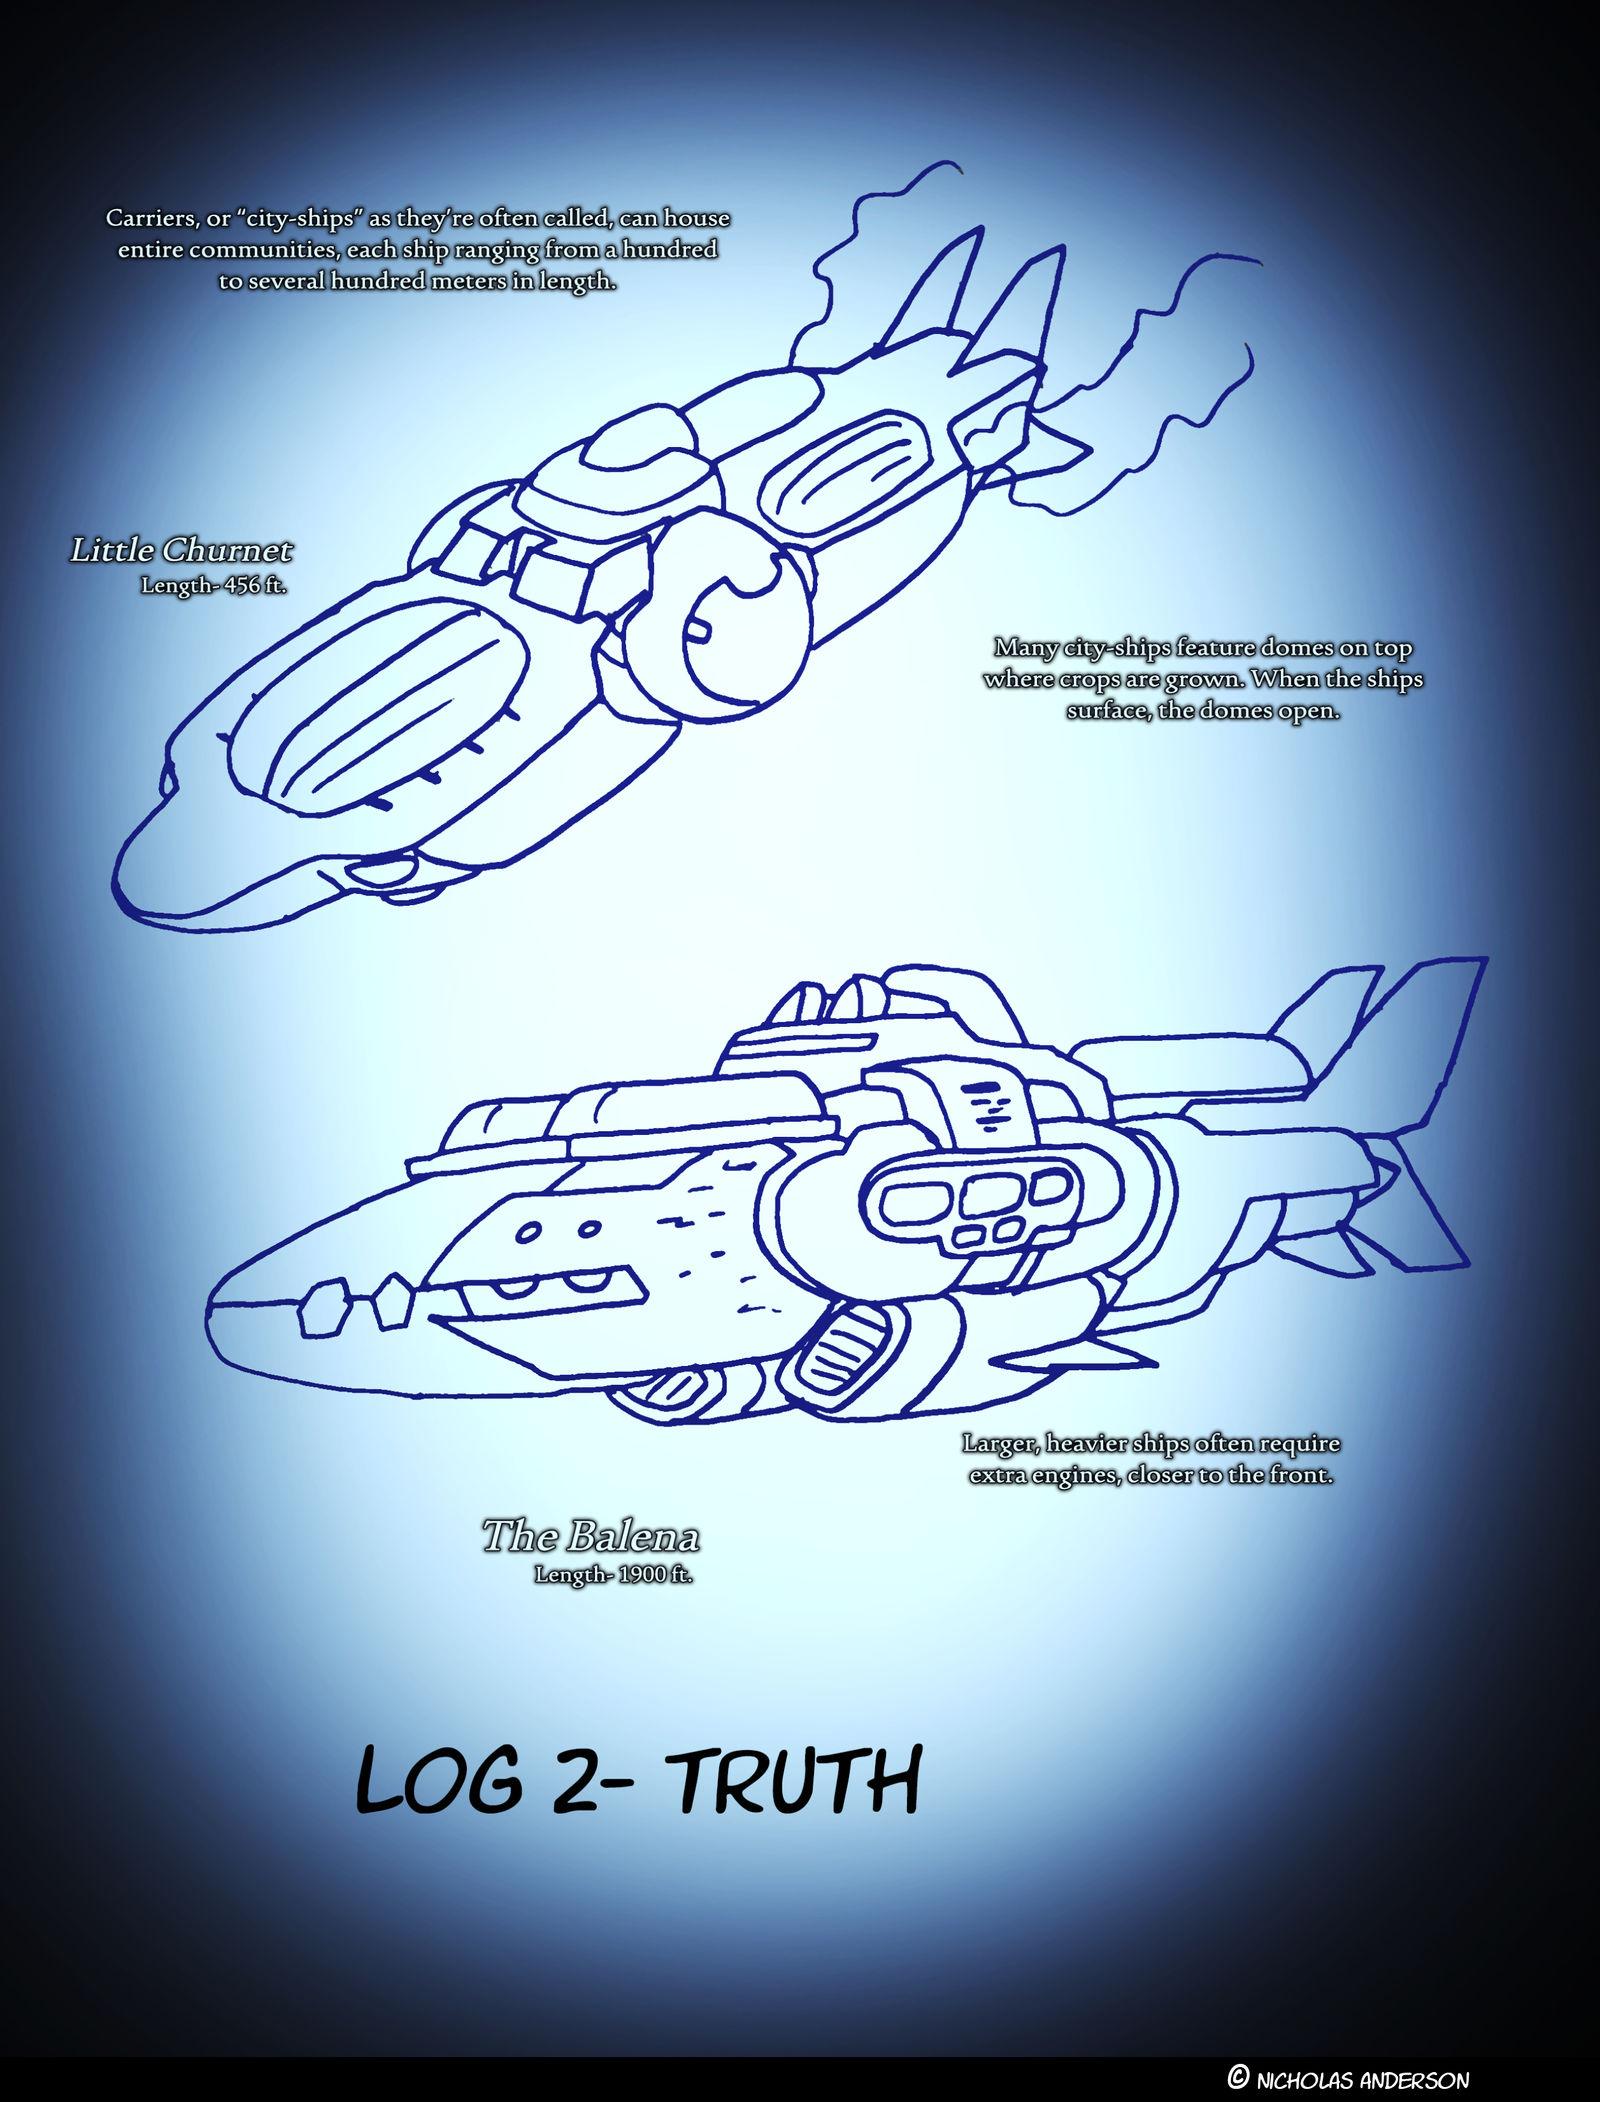 Planet Ripple-22- City-ships